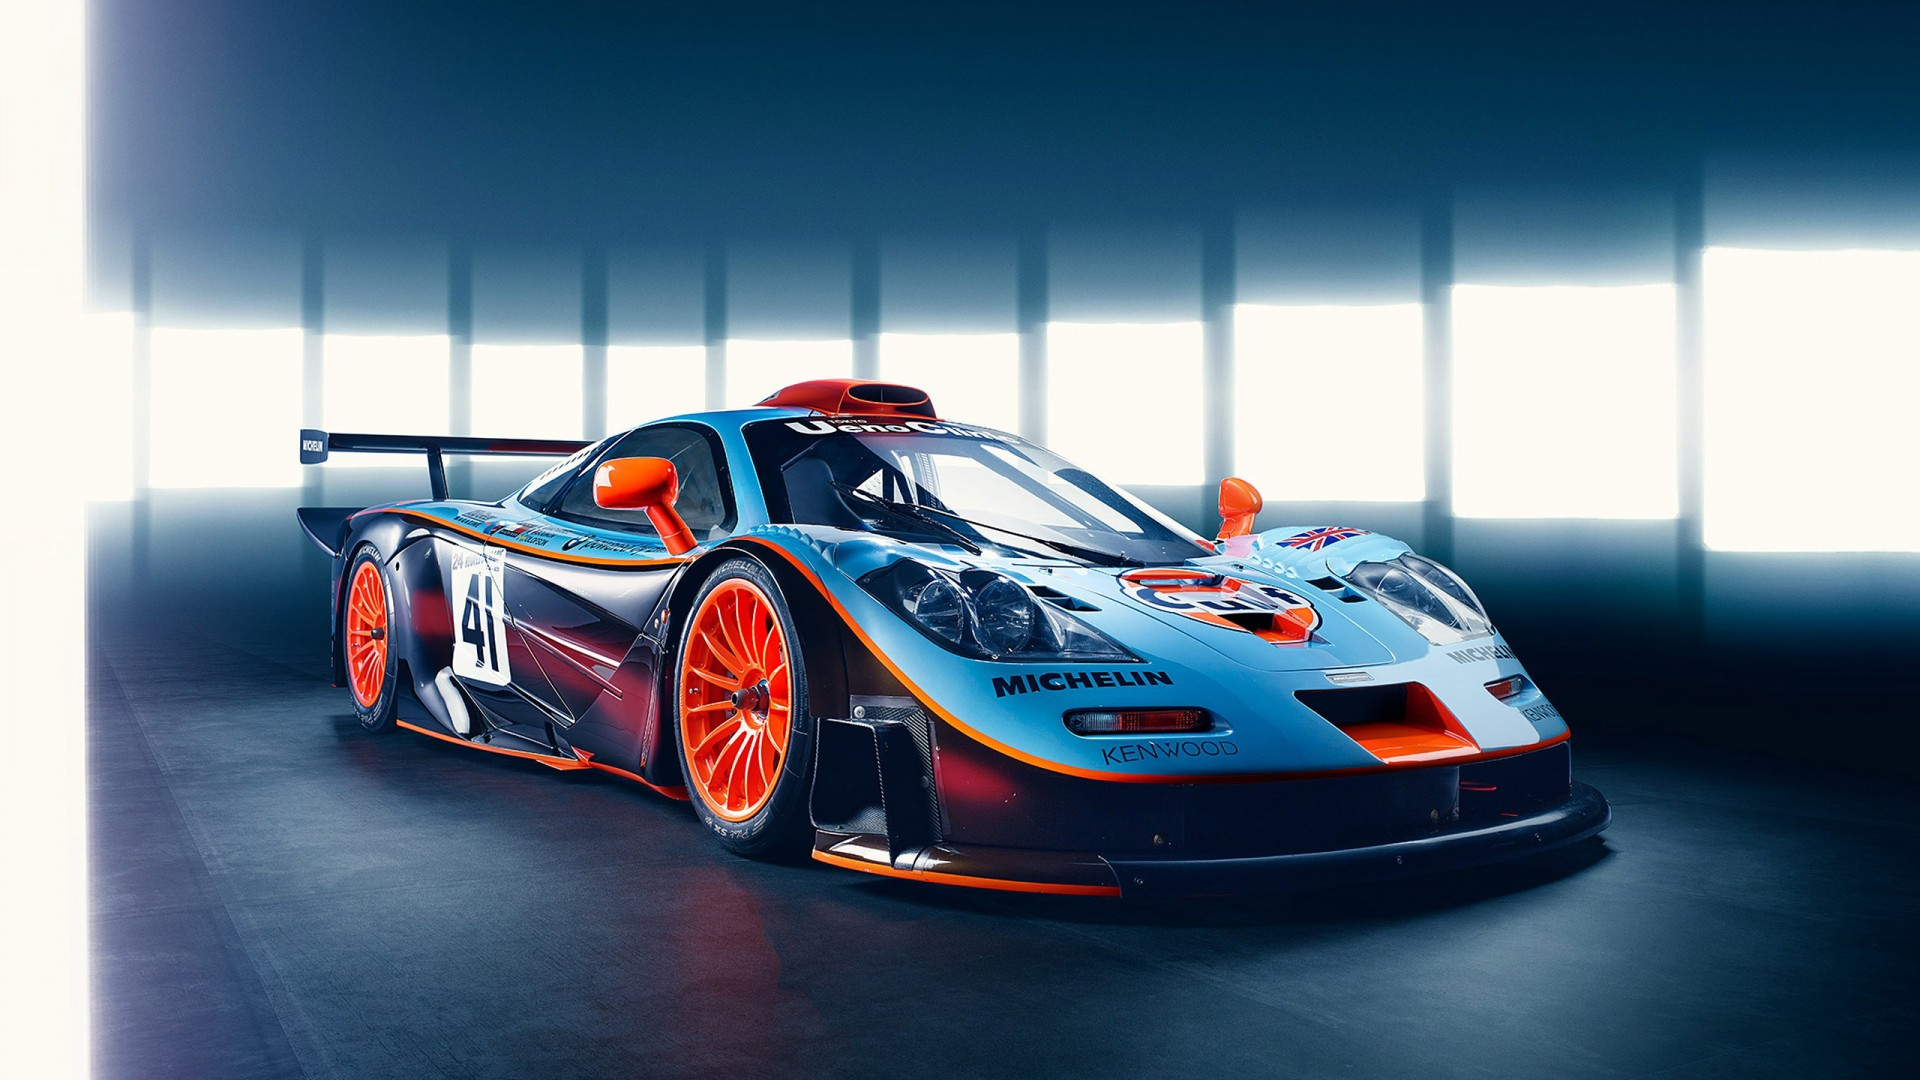 McLaren F1 GTR Longtail Wallpaper HD Car Wallpapers ID